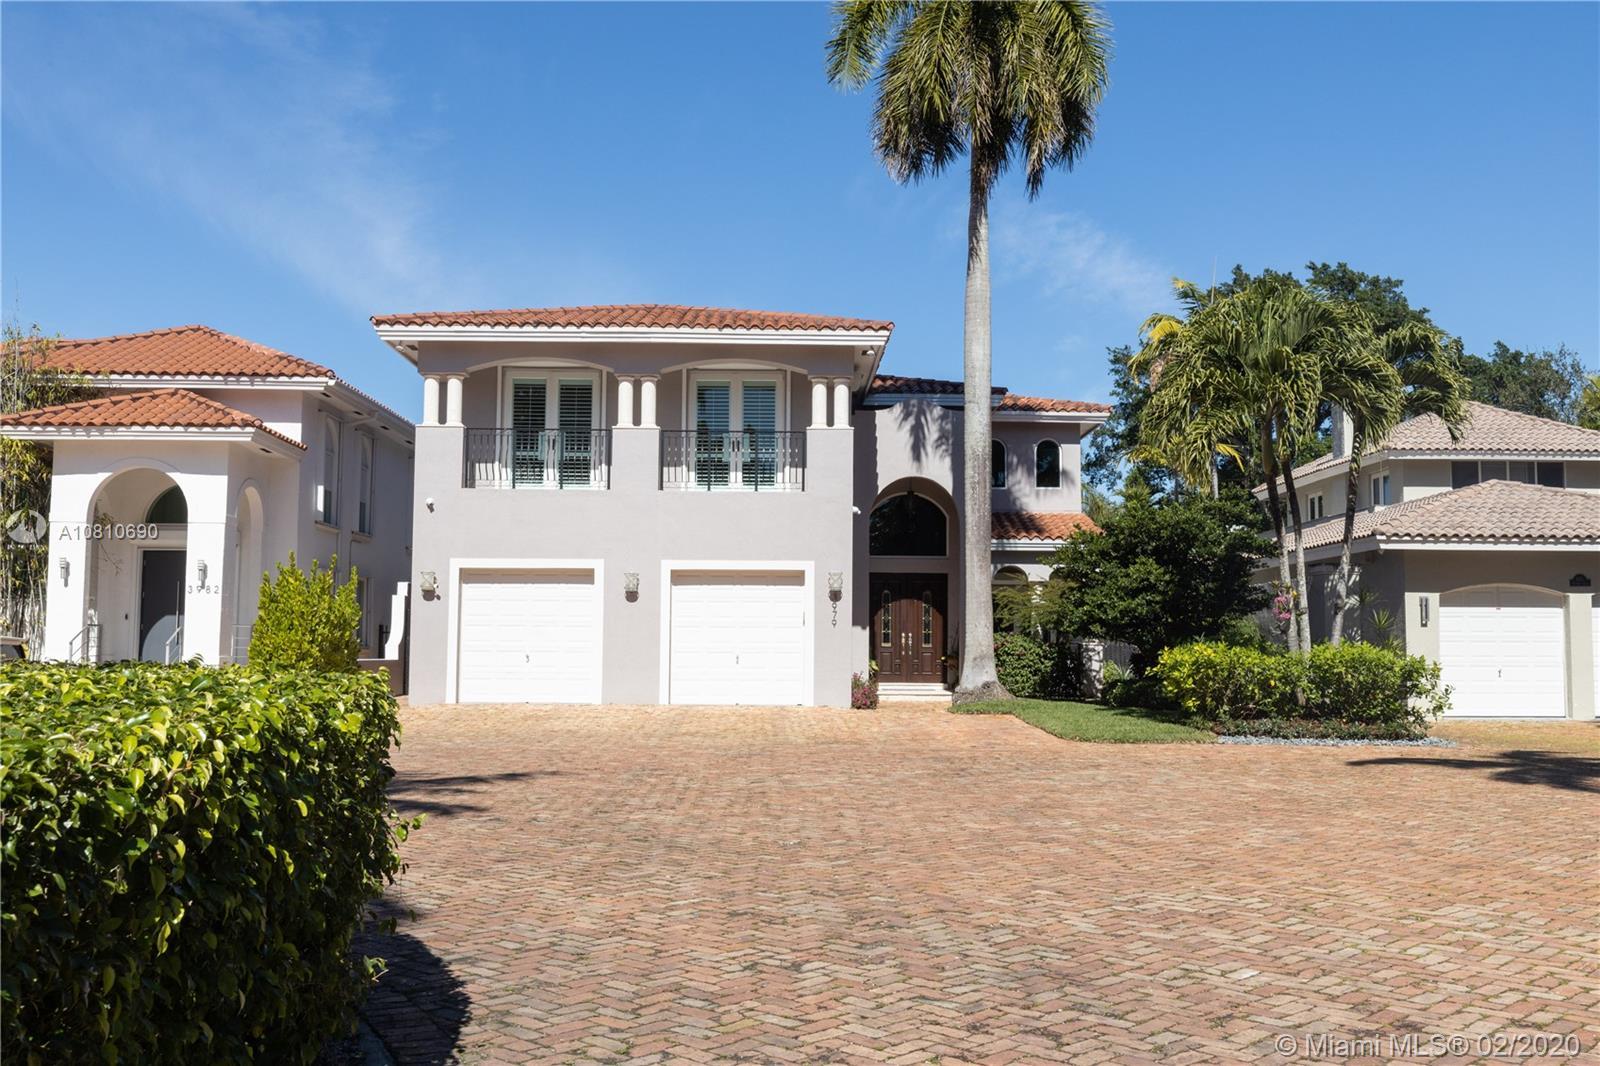 3979 Poinciana Closed Rd, Coral Gables, Florida